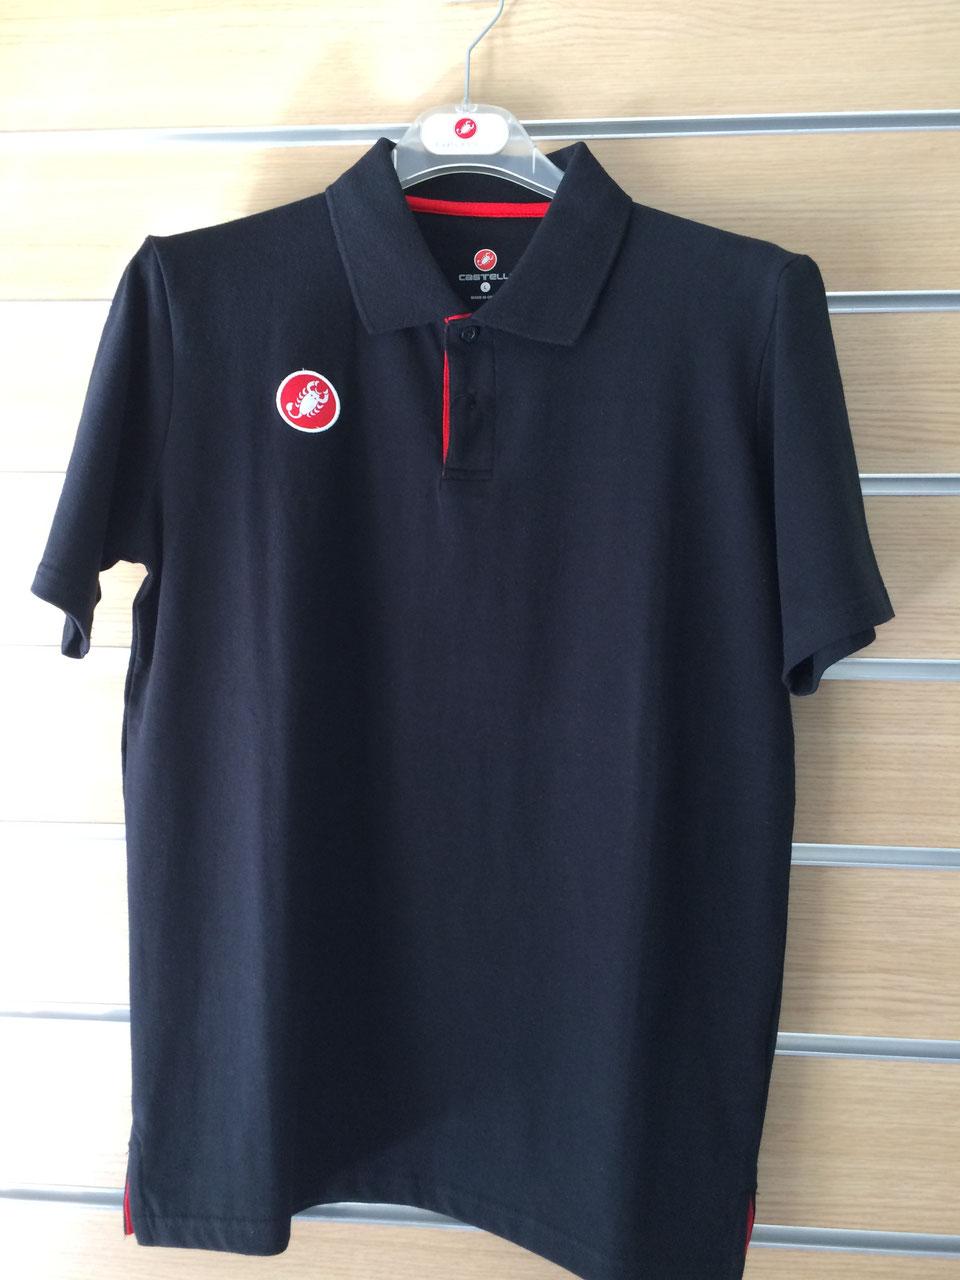 Castelli Cycling Clothes   Camisetas de ciclismo